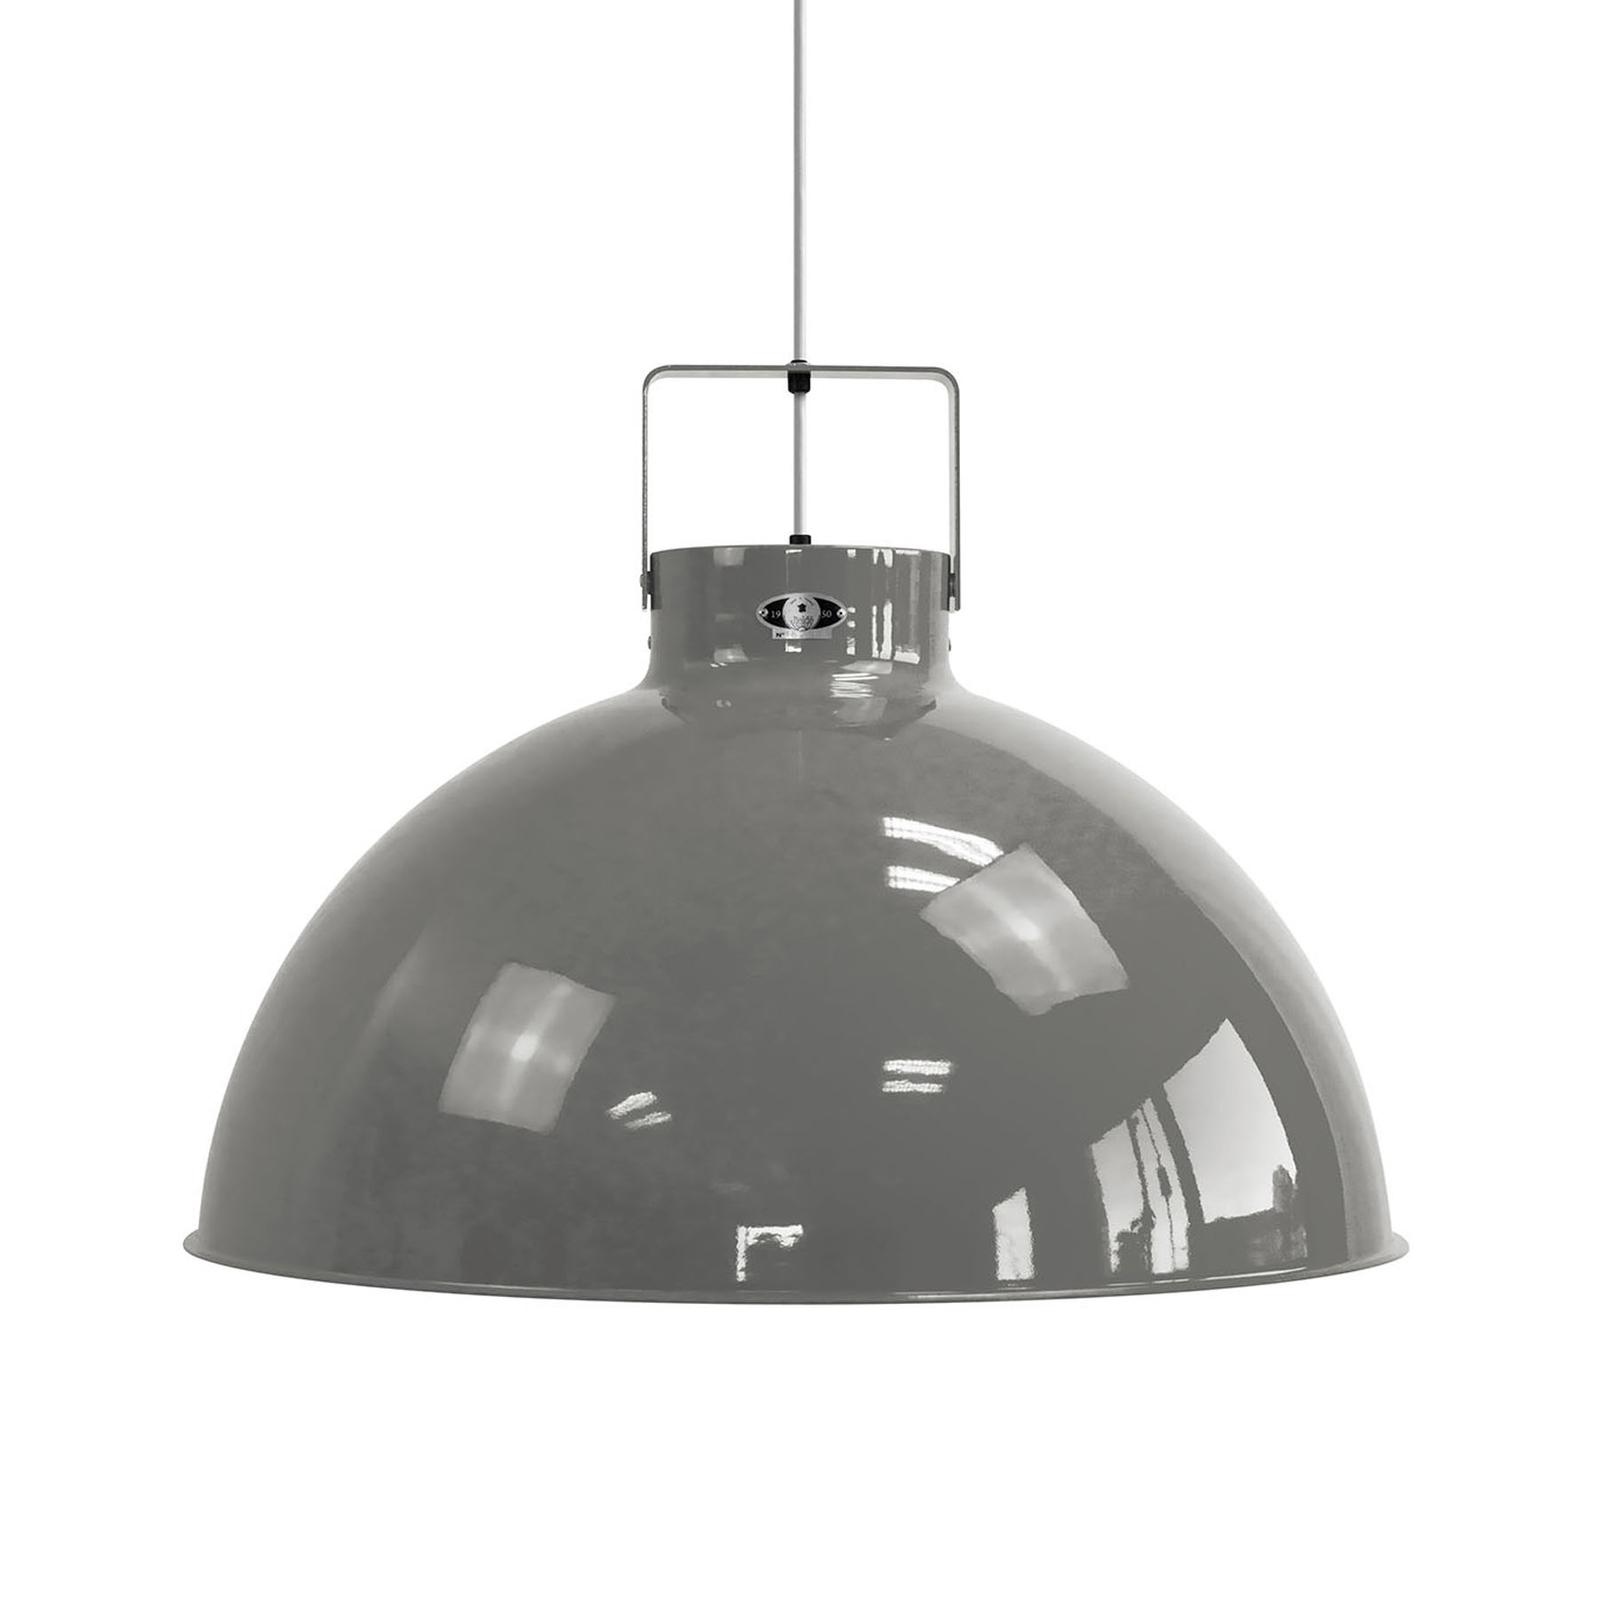 Jieldé Dante D675 lampa wisząca, szara, Ø 67,5 cm